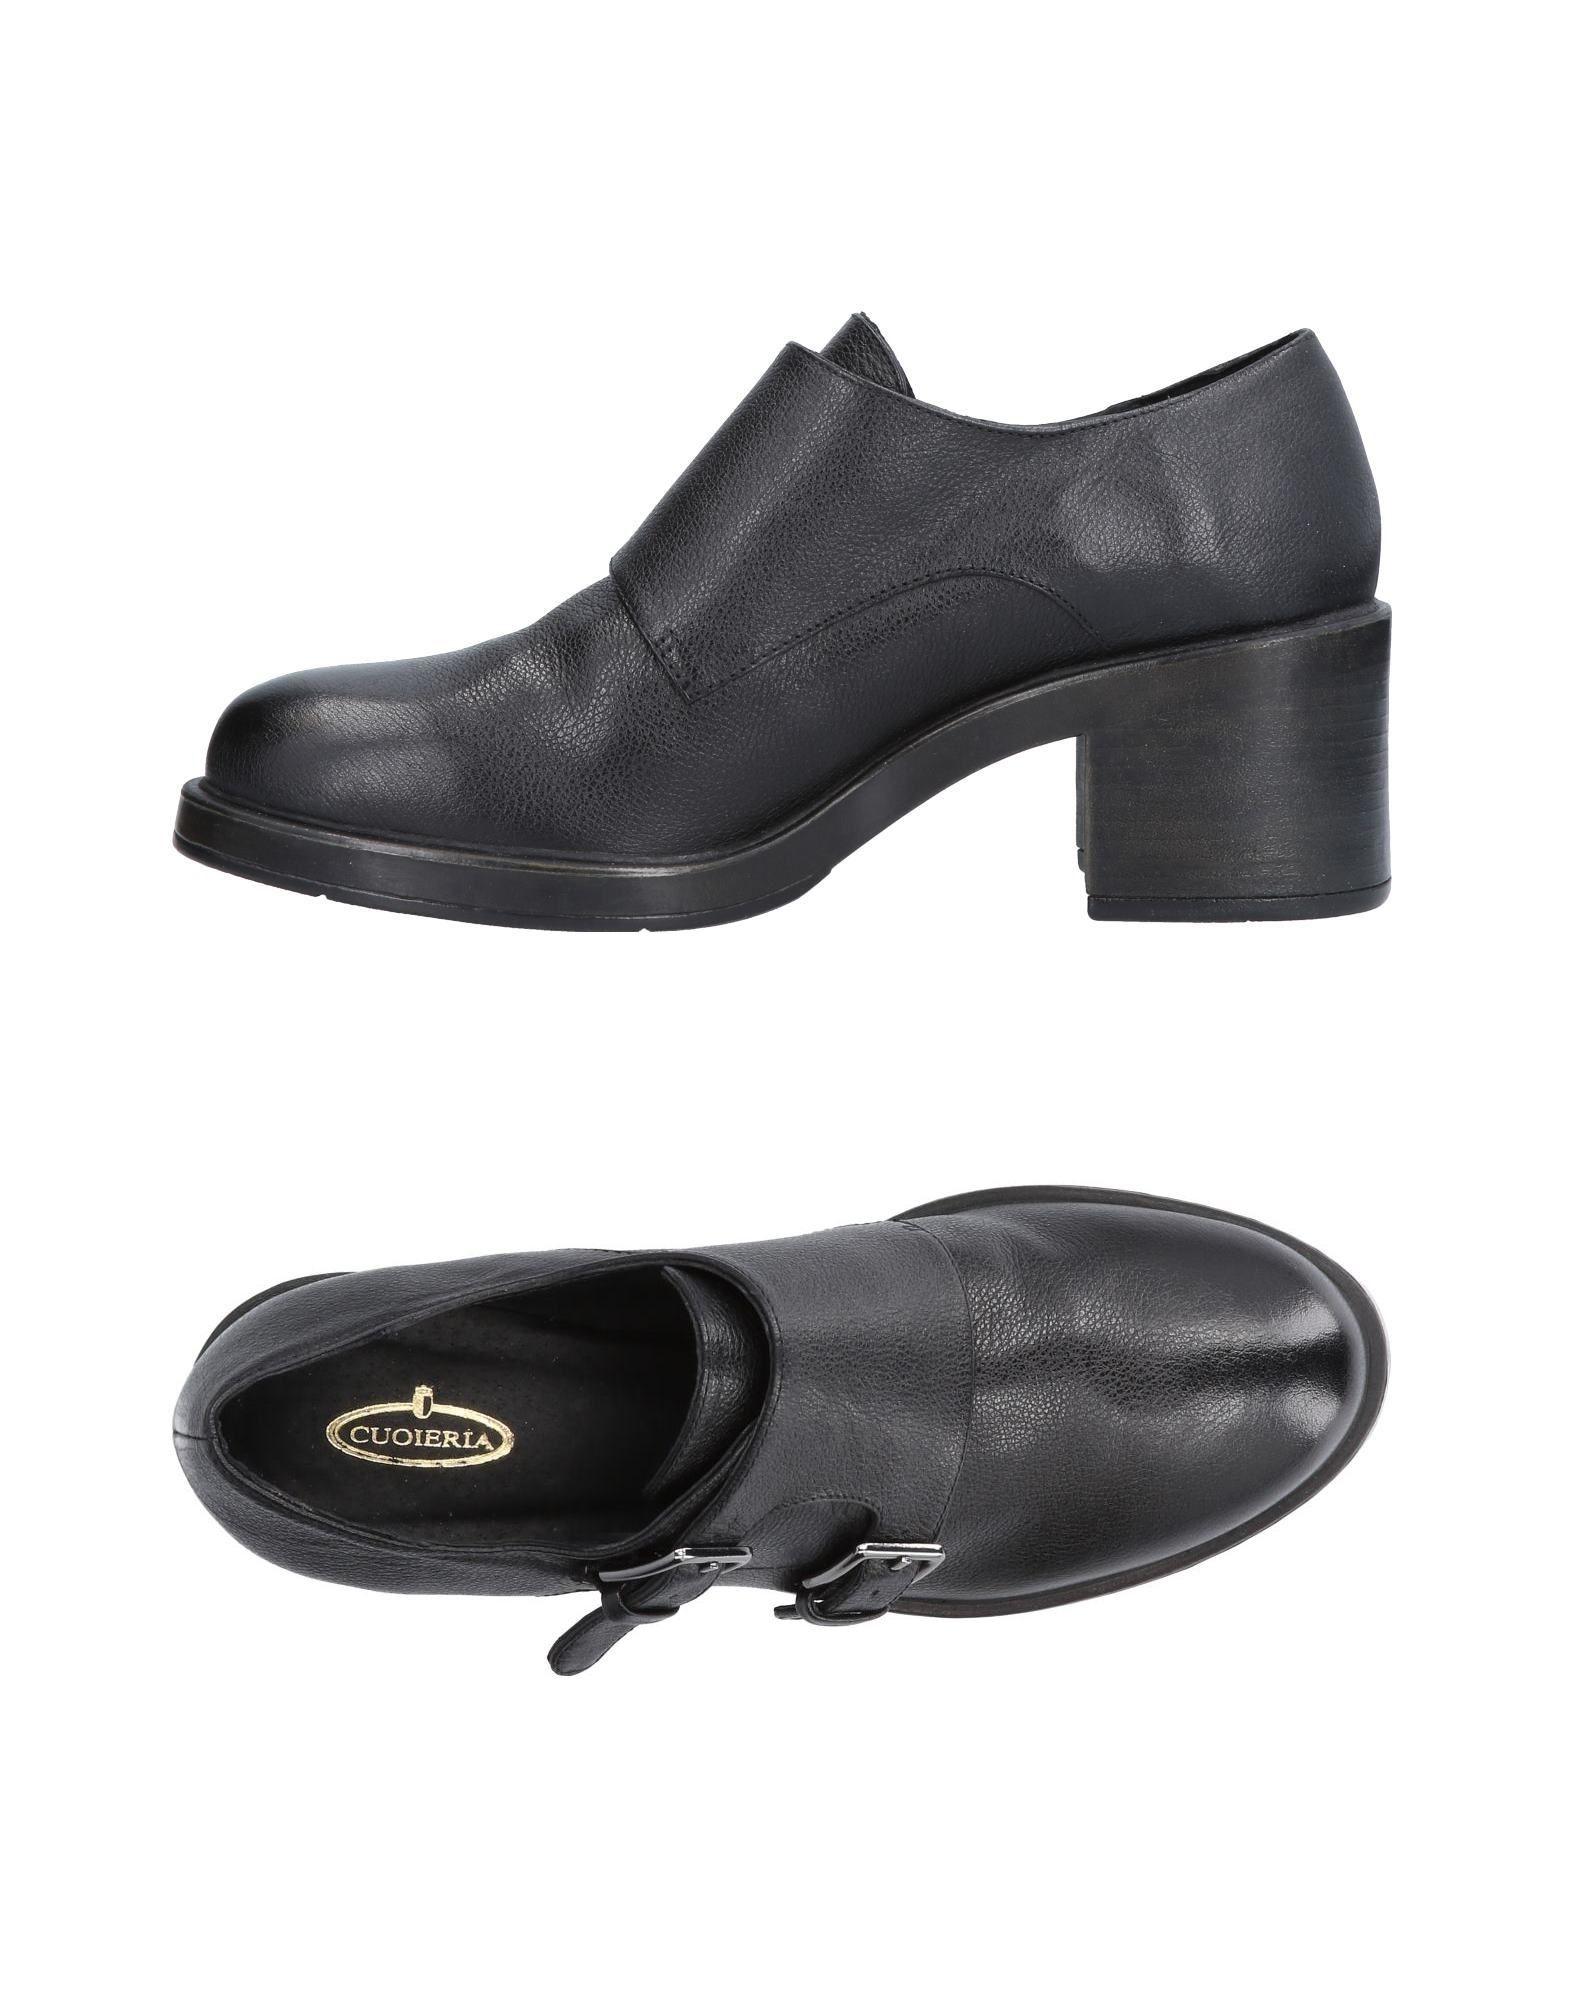 Cuoieria Mokassins Damen  beliebte 11483346FE Gute Qualität beliebte  Schuhe 46c469